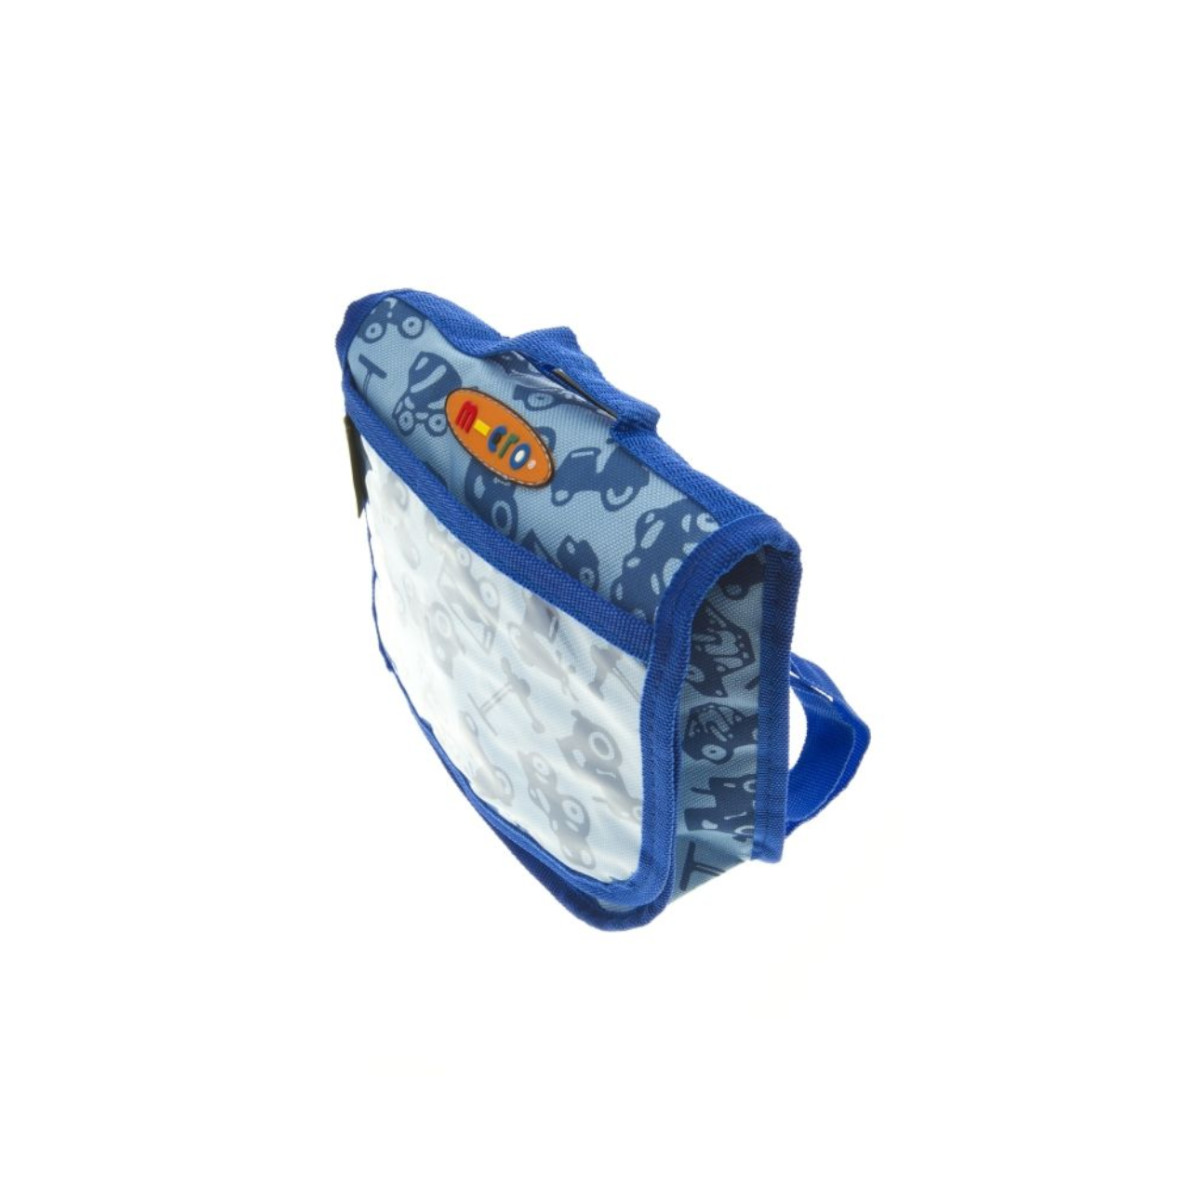 Batoh Micro Blue - 02